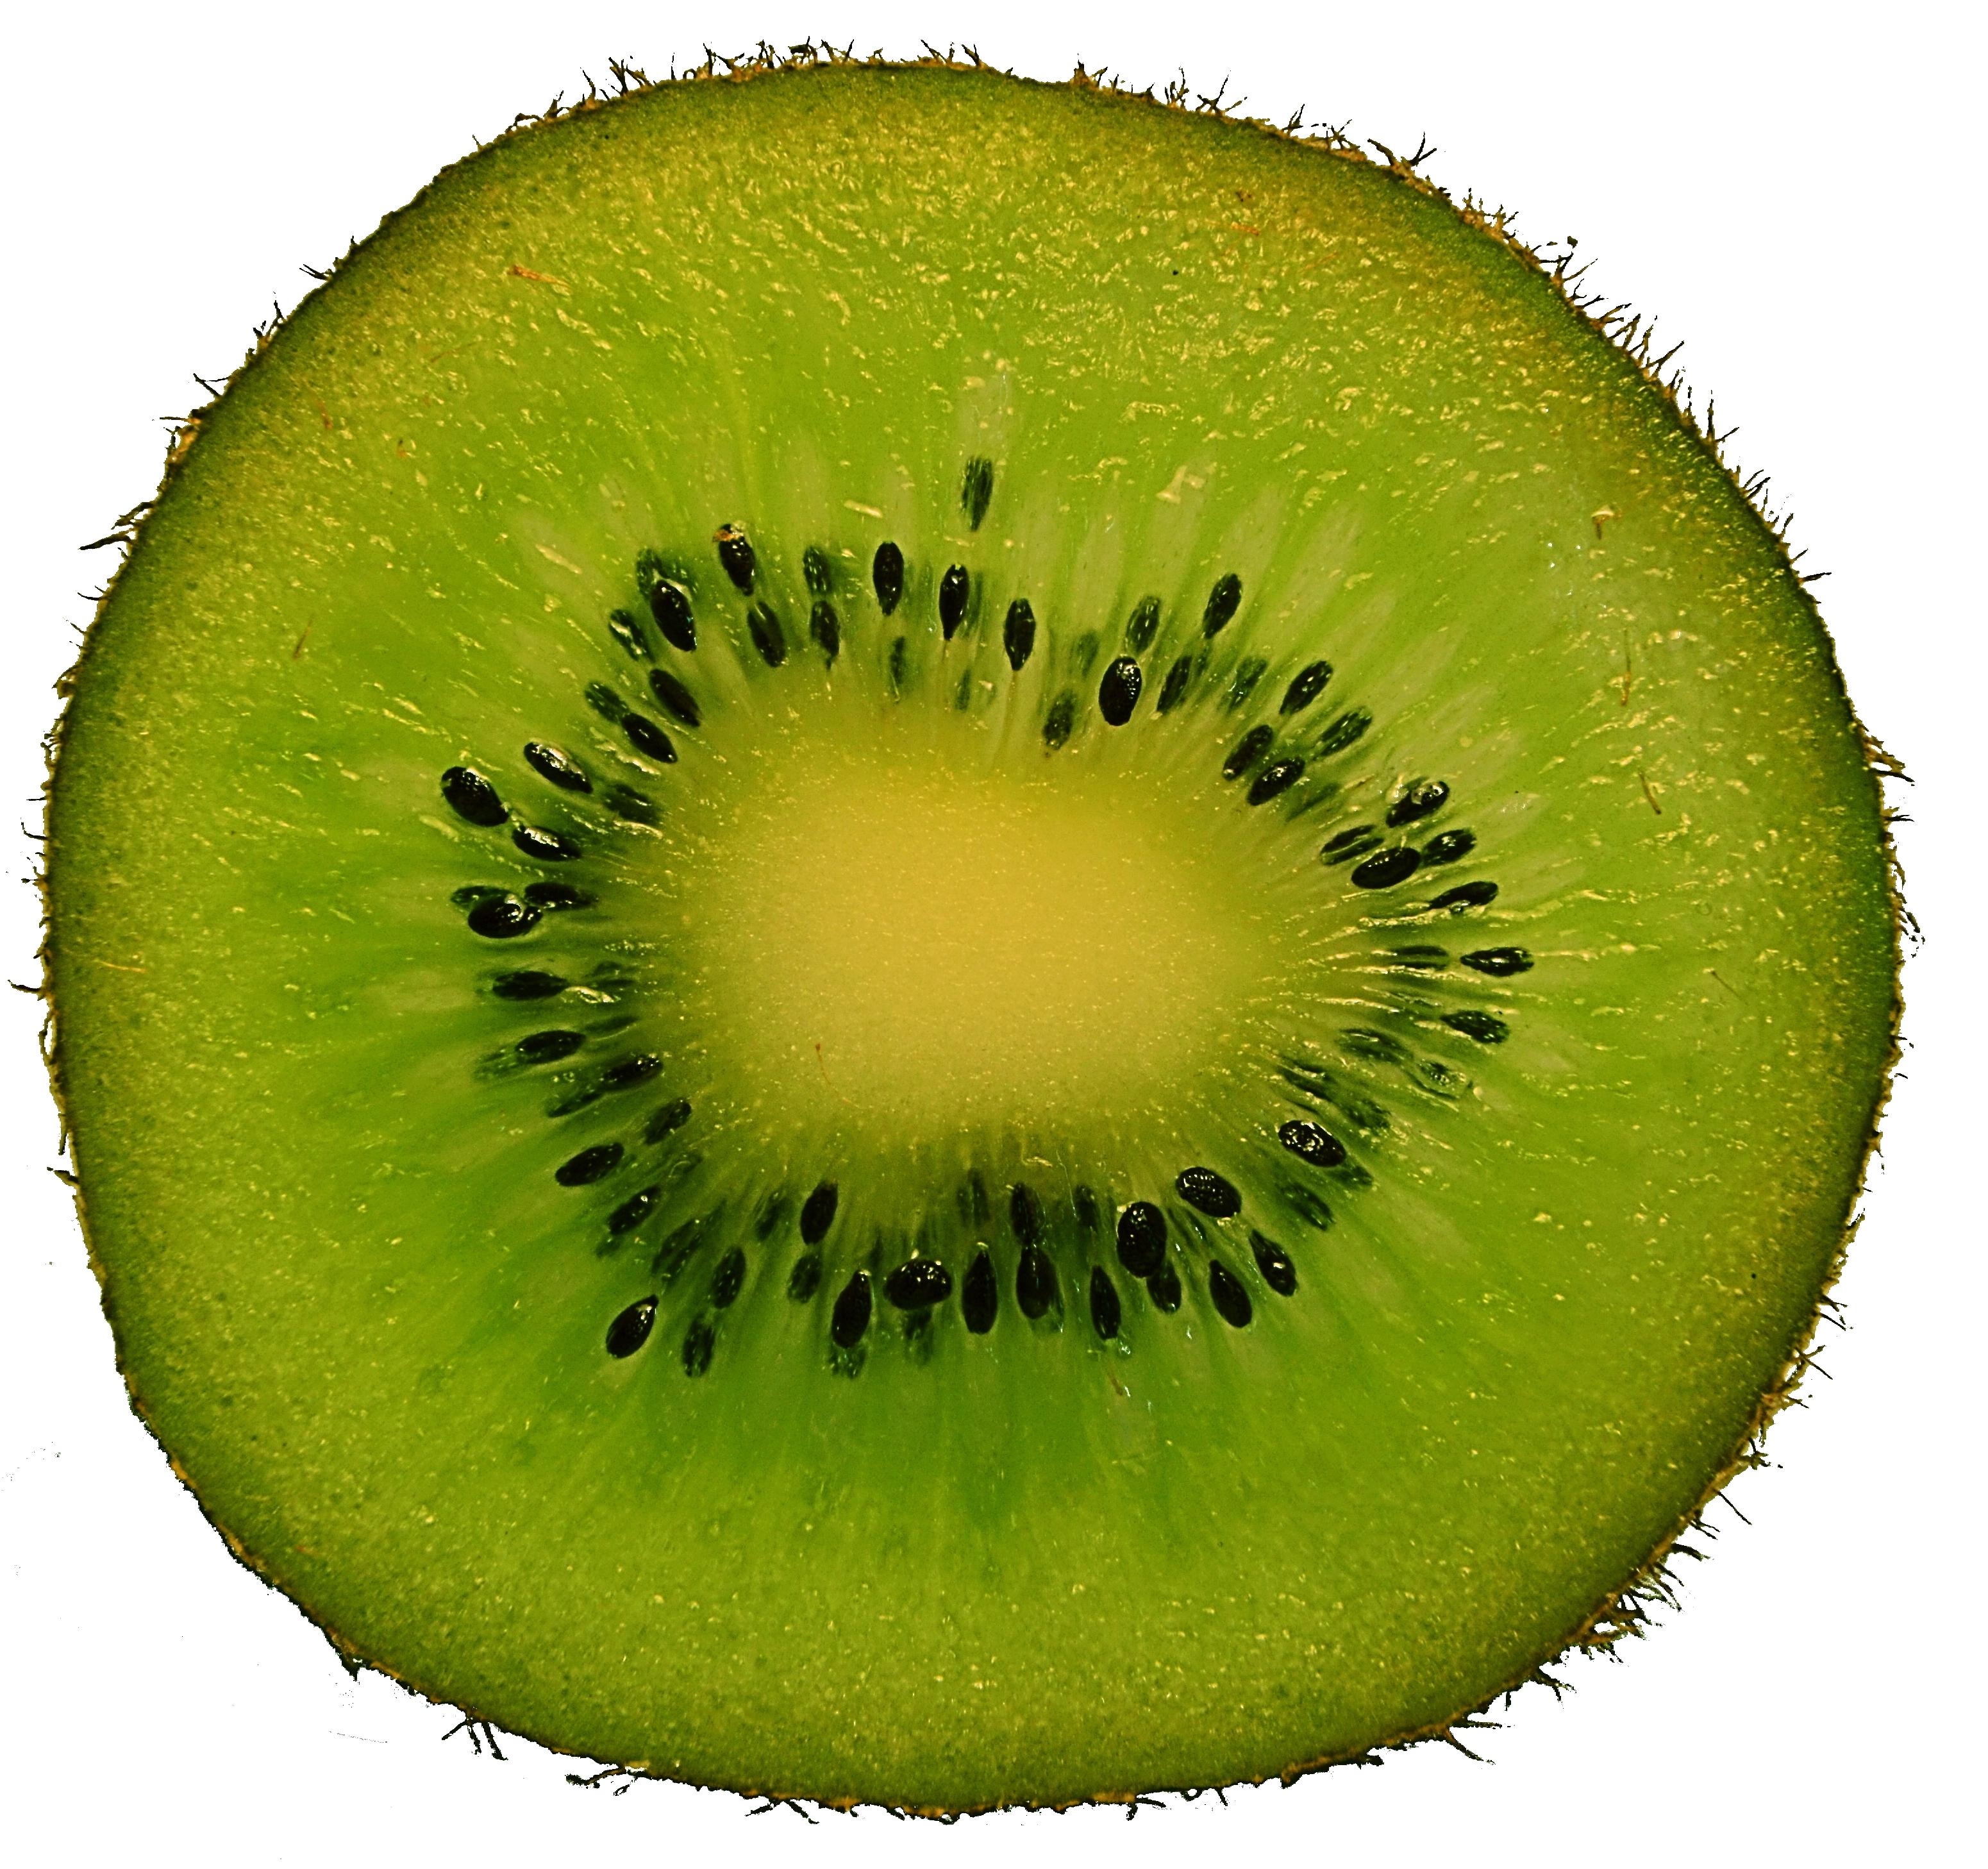 A sliced kiwifruit. Photo taken on March 28, 2015.